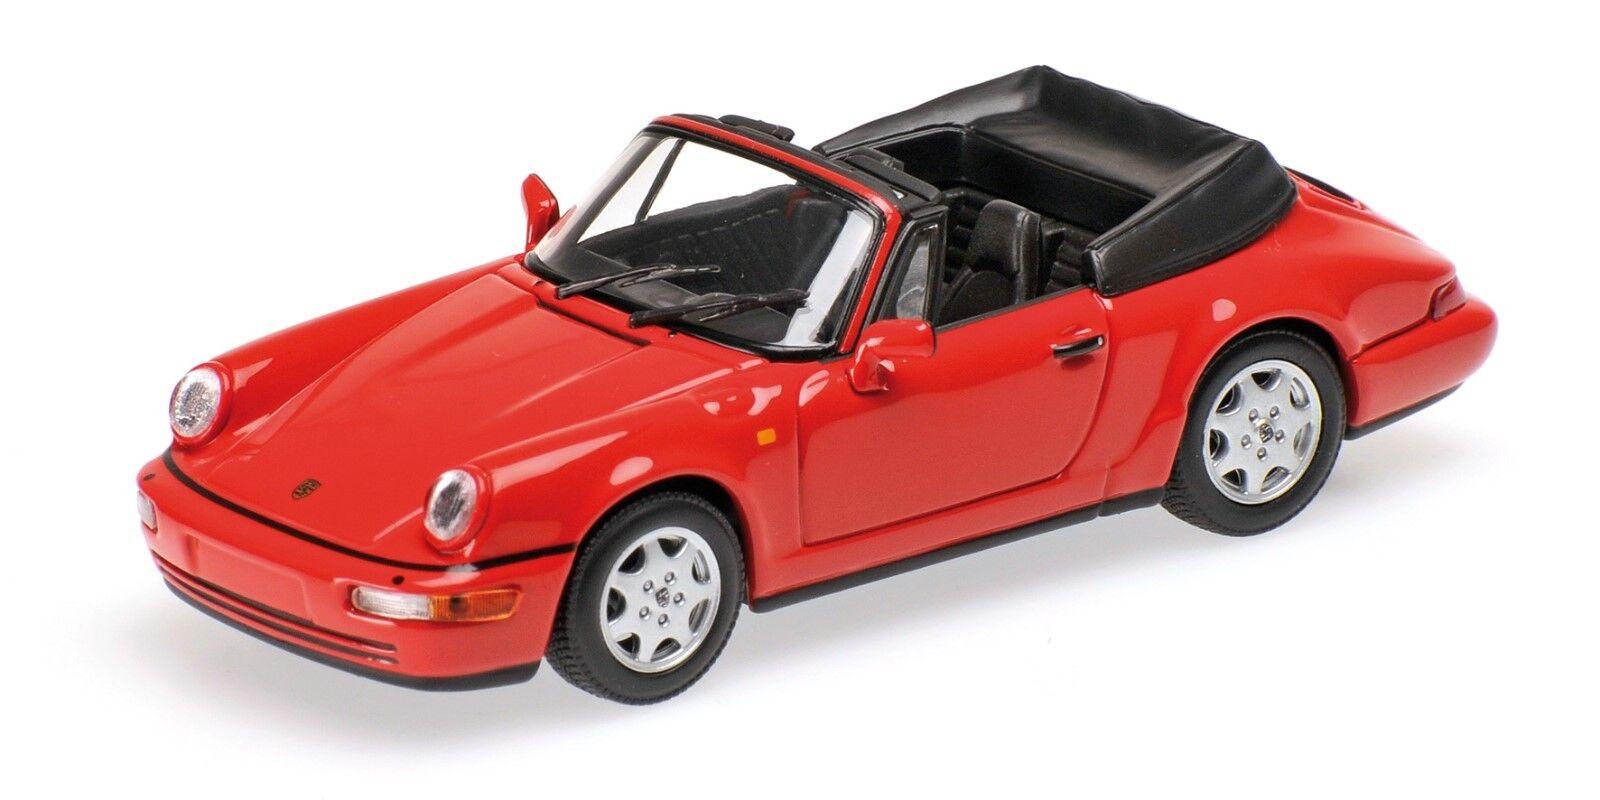 MINICHAMPS  PORSCHE 911 ( 964 ) CABRIOLET  1990   OVP  1 43  ROT  LIM. 504